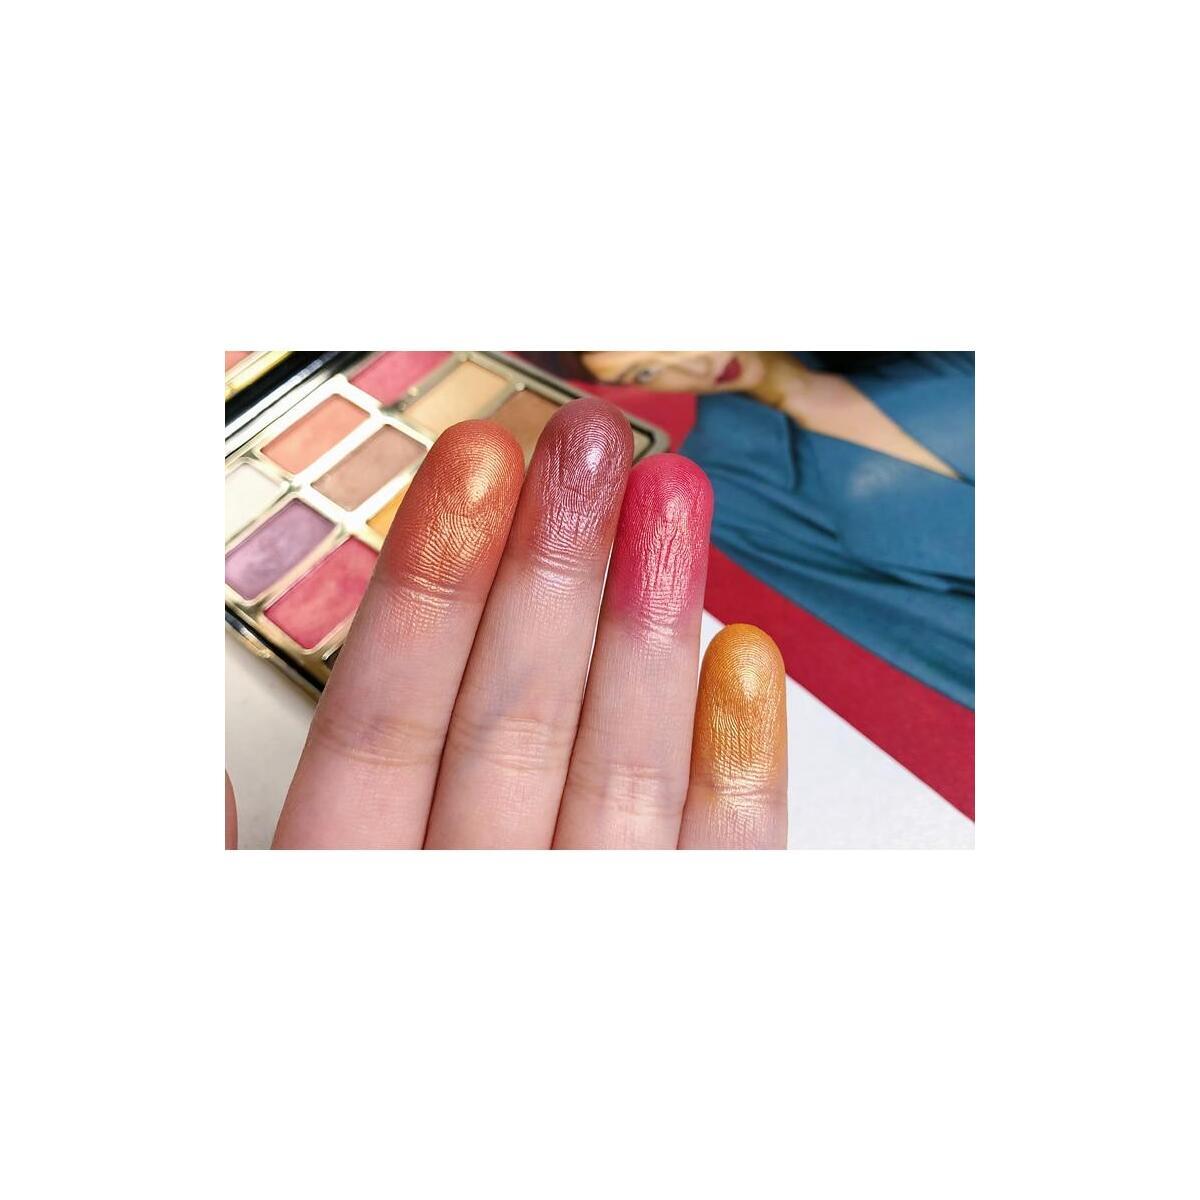 RomanticBird Febble Eyeshadow Diamond Glitter Metallic 12 Color Eyeshadow Palette, 01 / United States